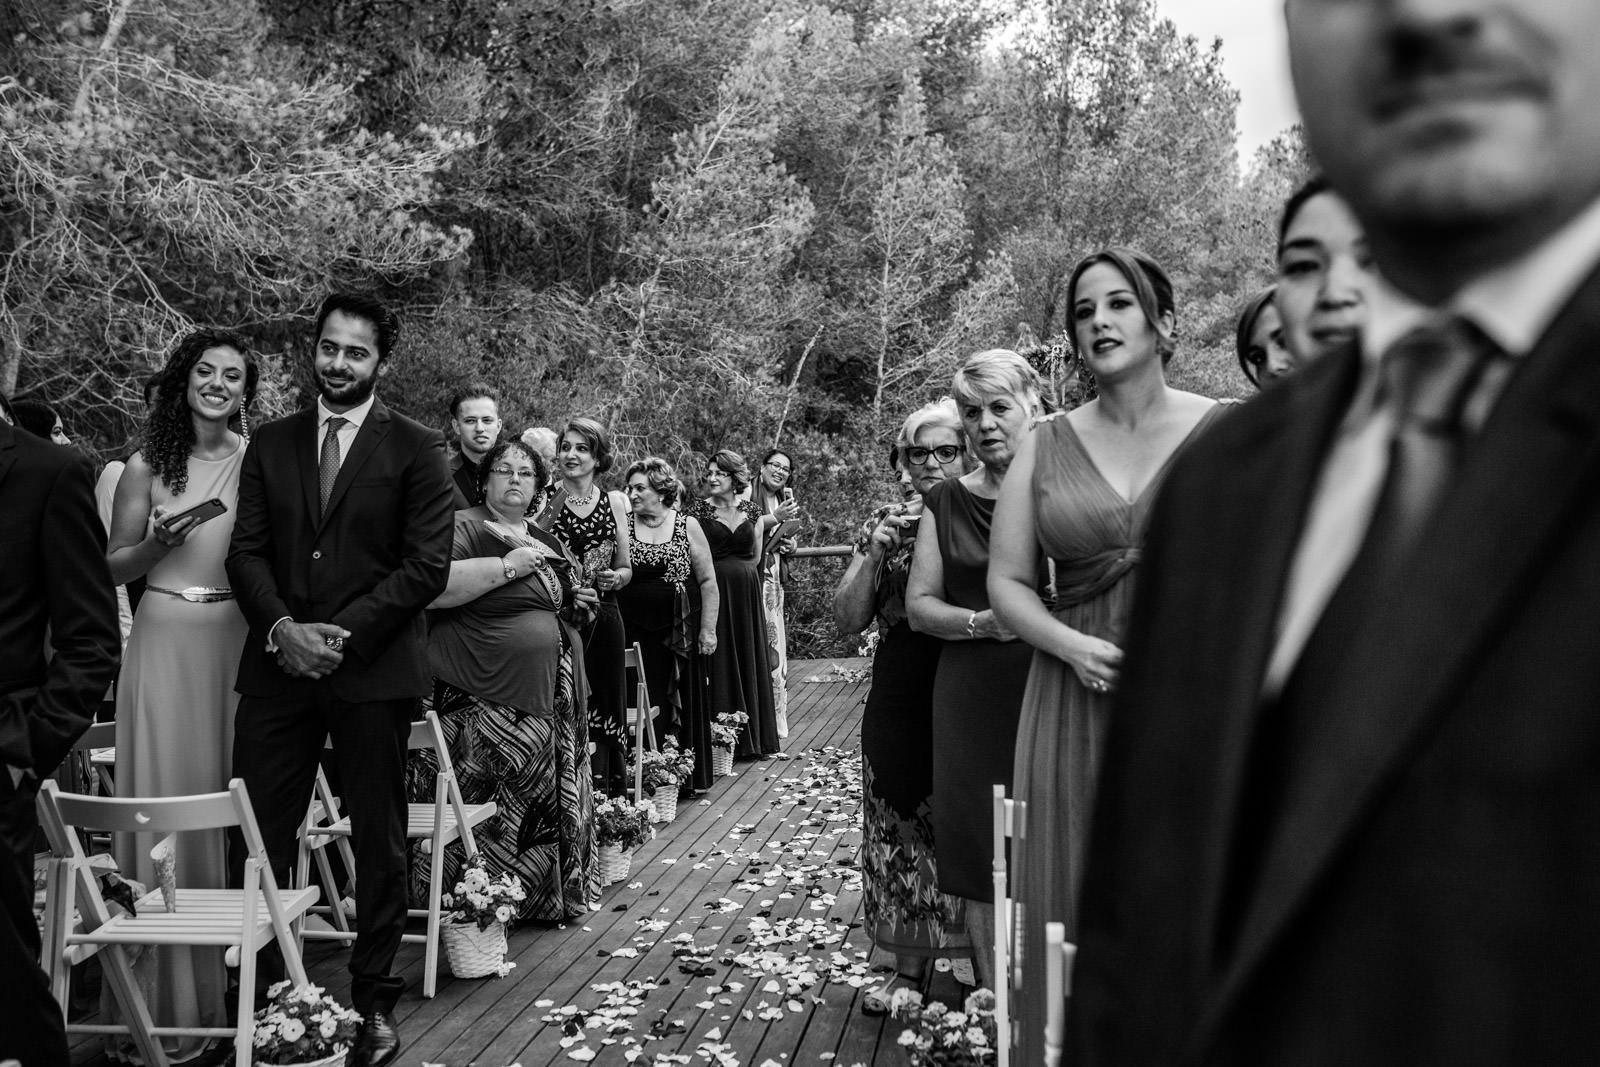 Almirall-Font-sitges-marbella-engagement-Rafael-Torres-fotografo-bodas-sevilla-madrid-barcelona-wedding-photographer--32.jpg